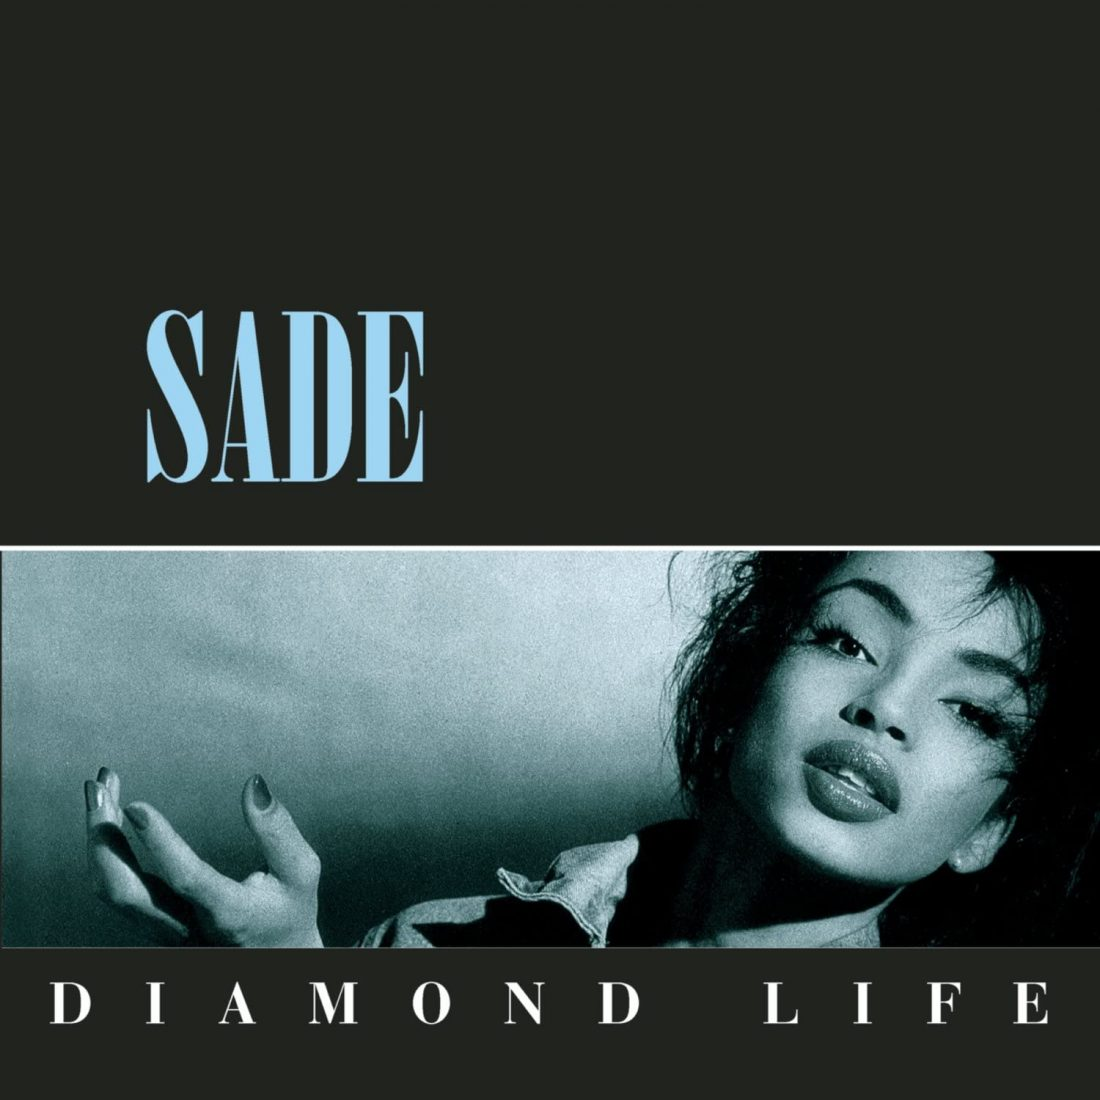 Sade Diamond Life cover